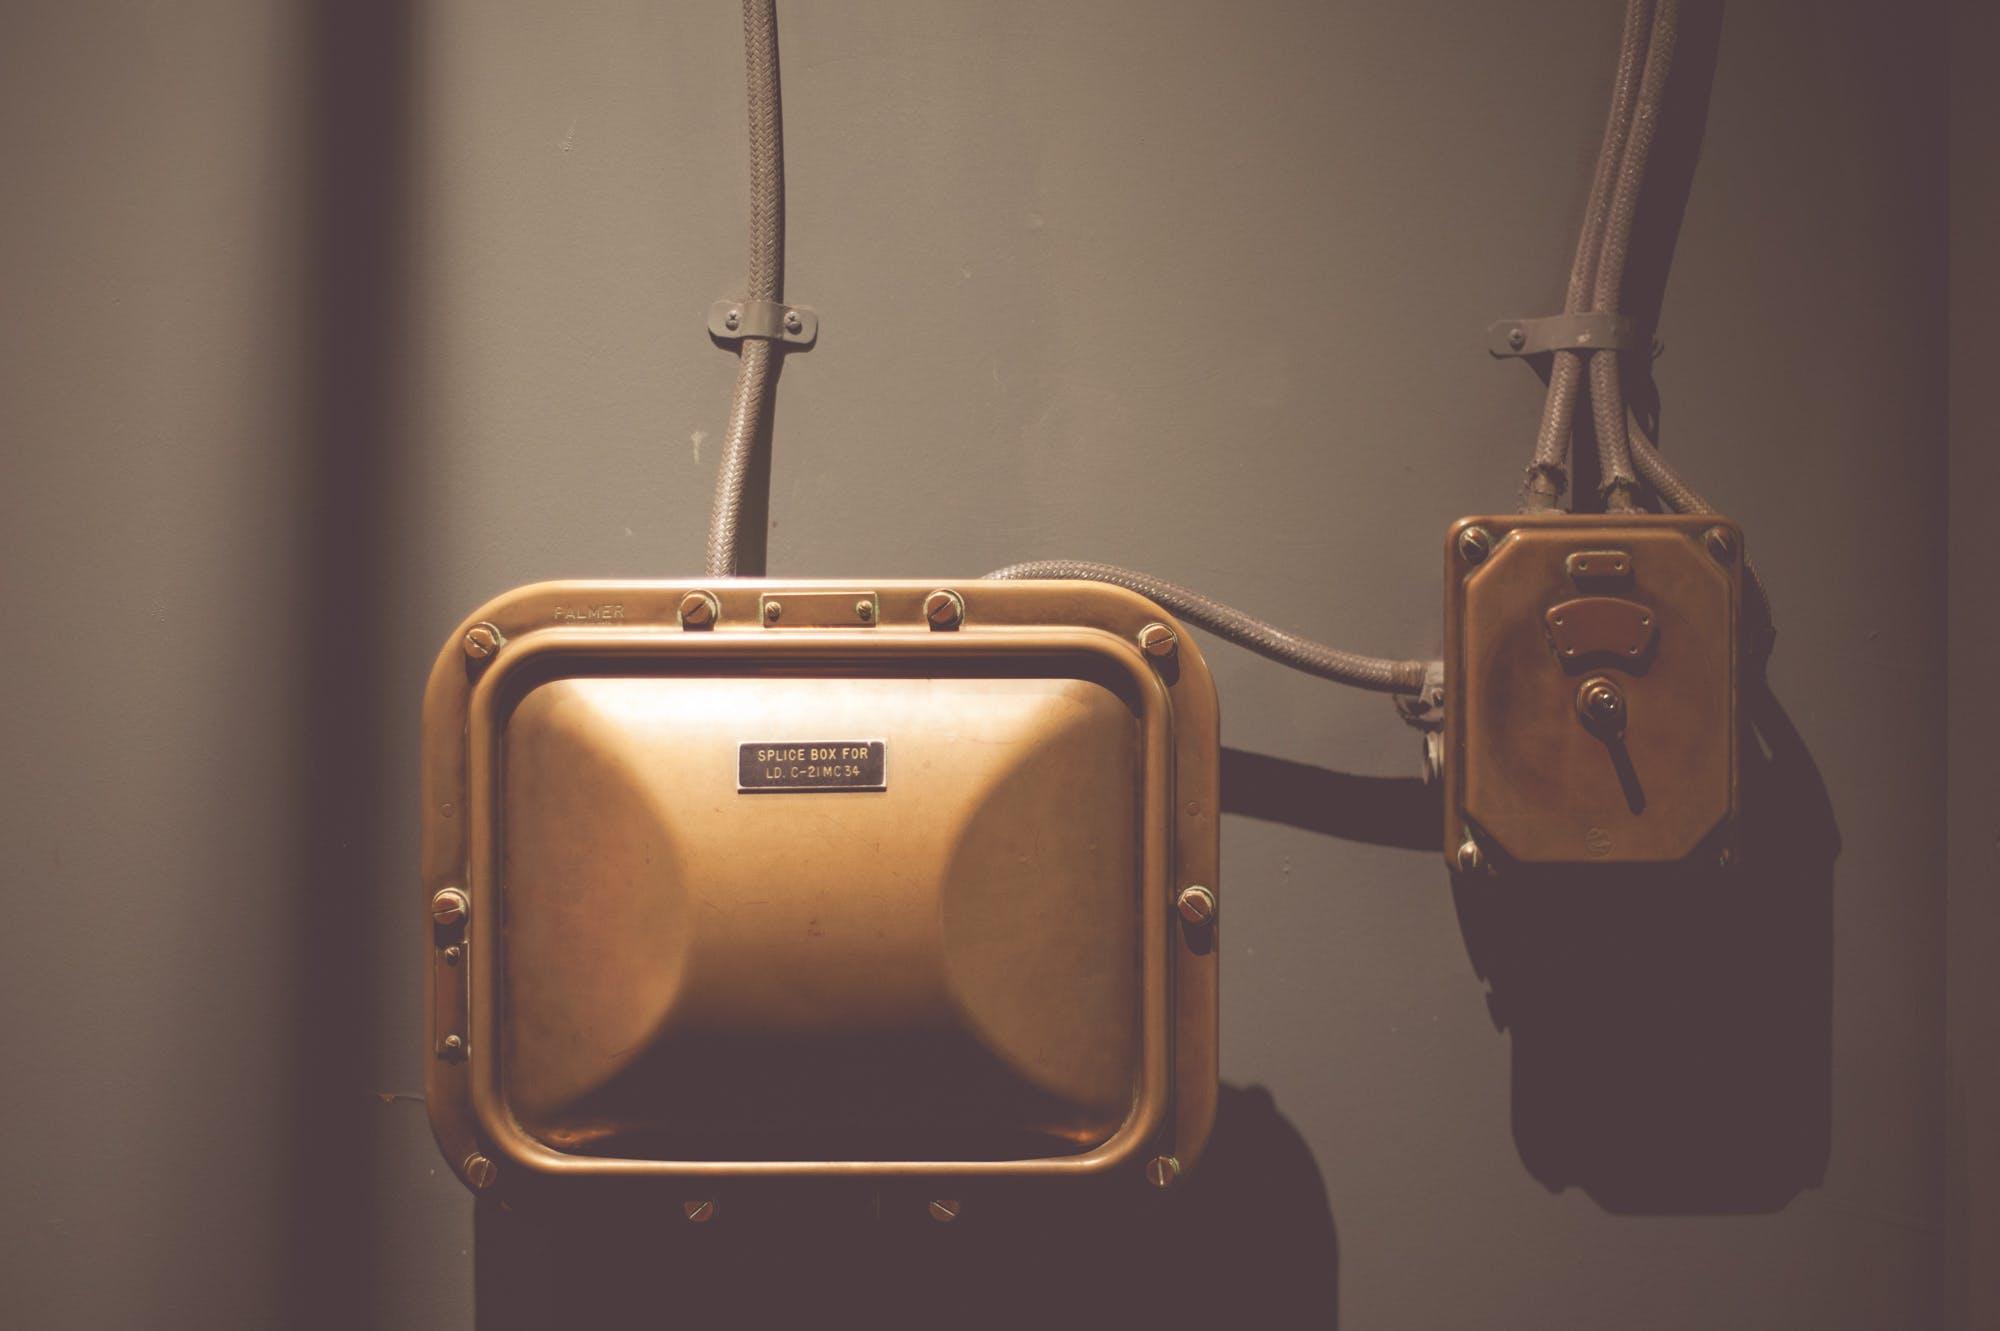 Free stock photo of indoors, machine, equipment, case